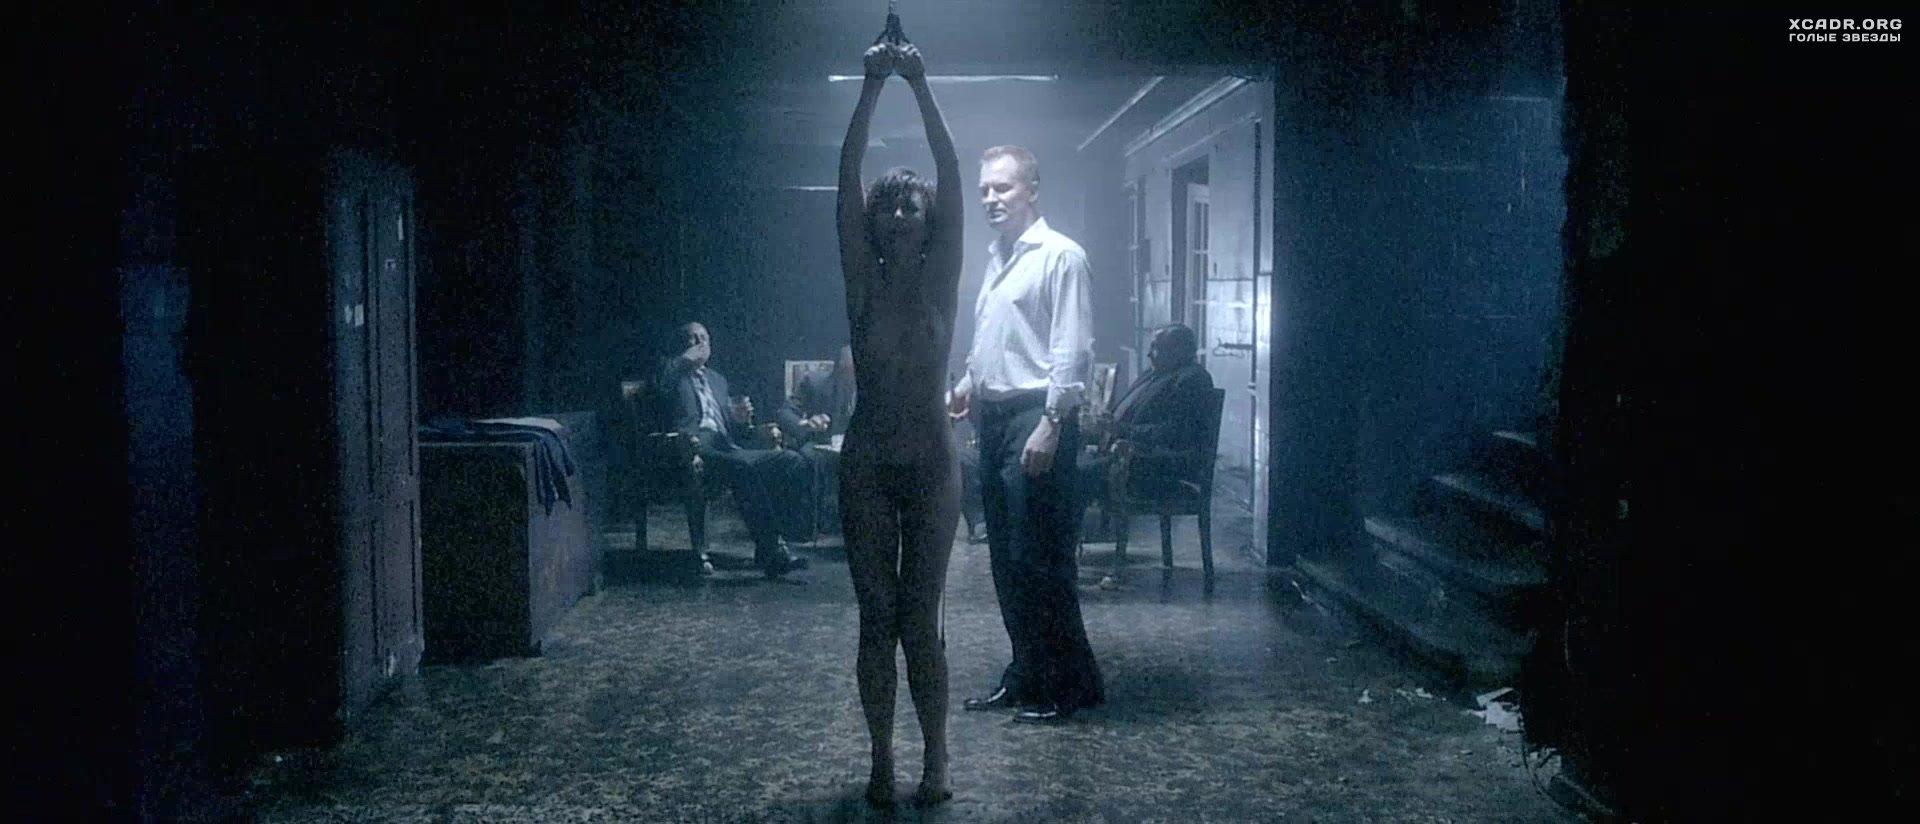 Hitman nude scene erotic galleries